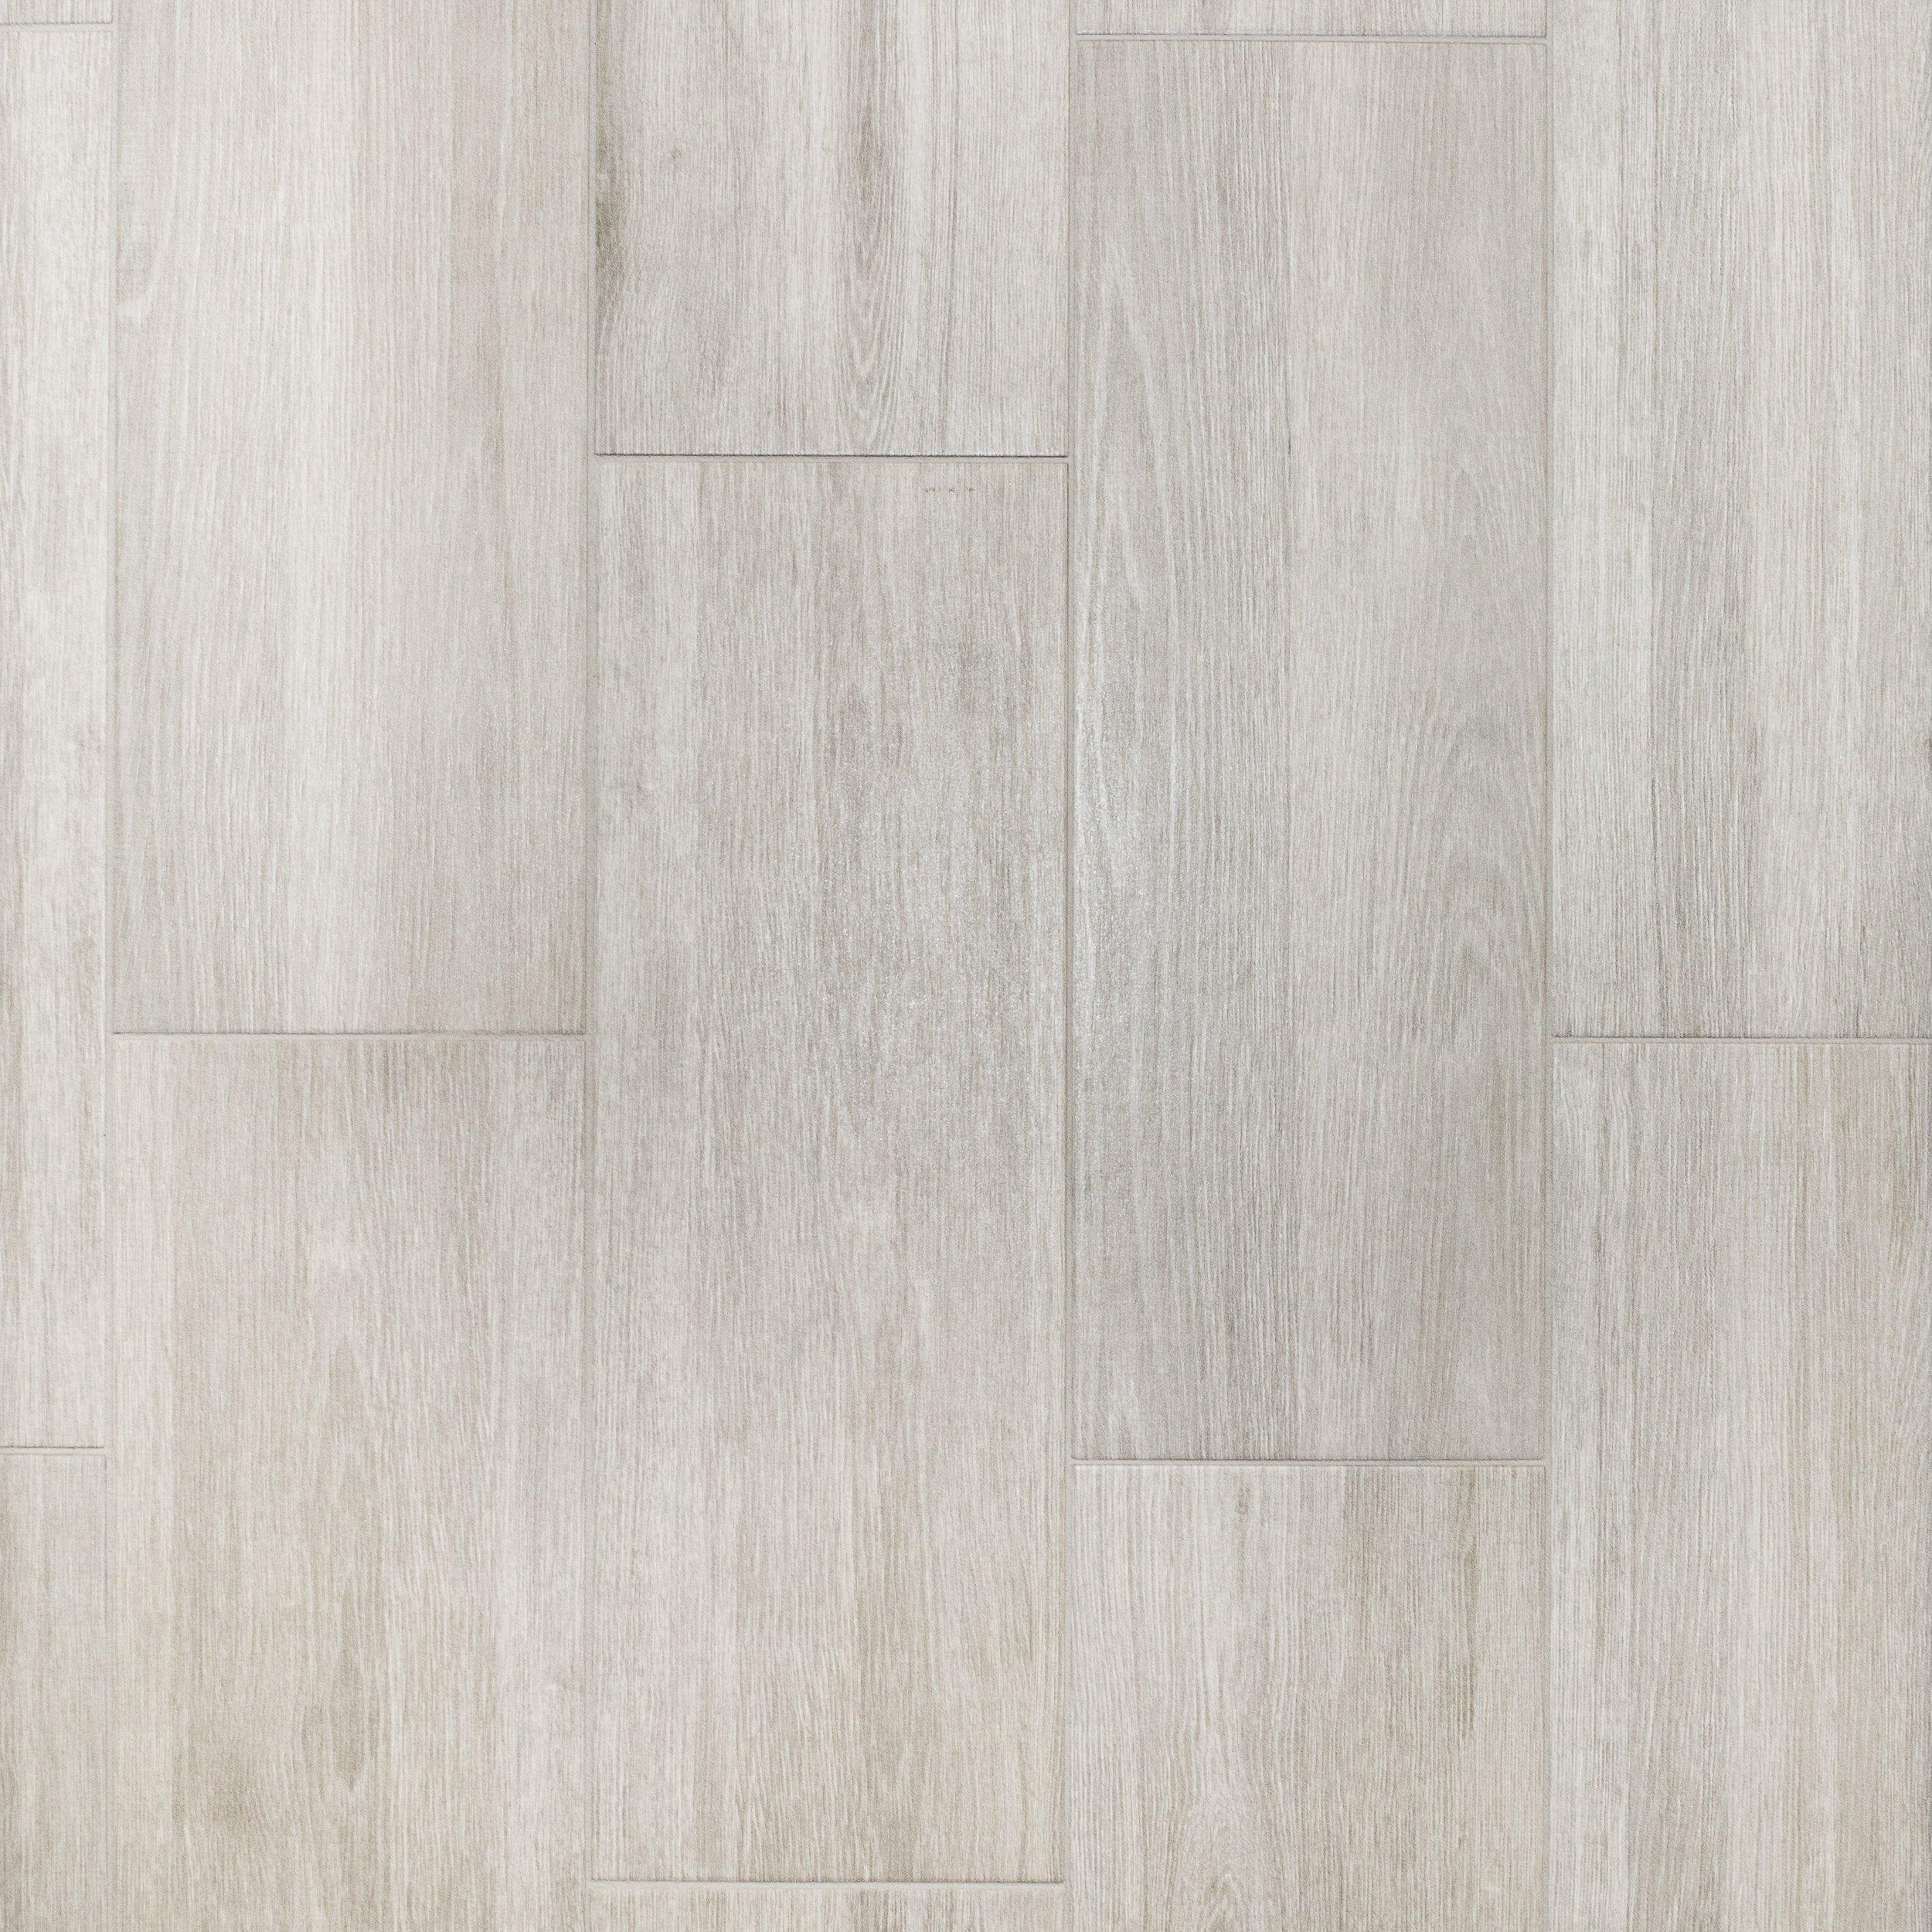 ceramic flooring ronne gris wood plank ceramic tile FZXRGWL